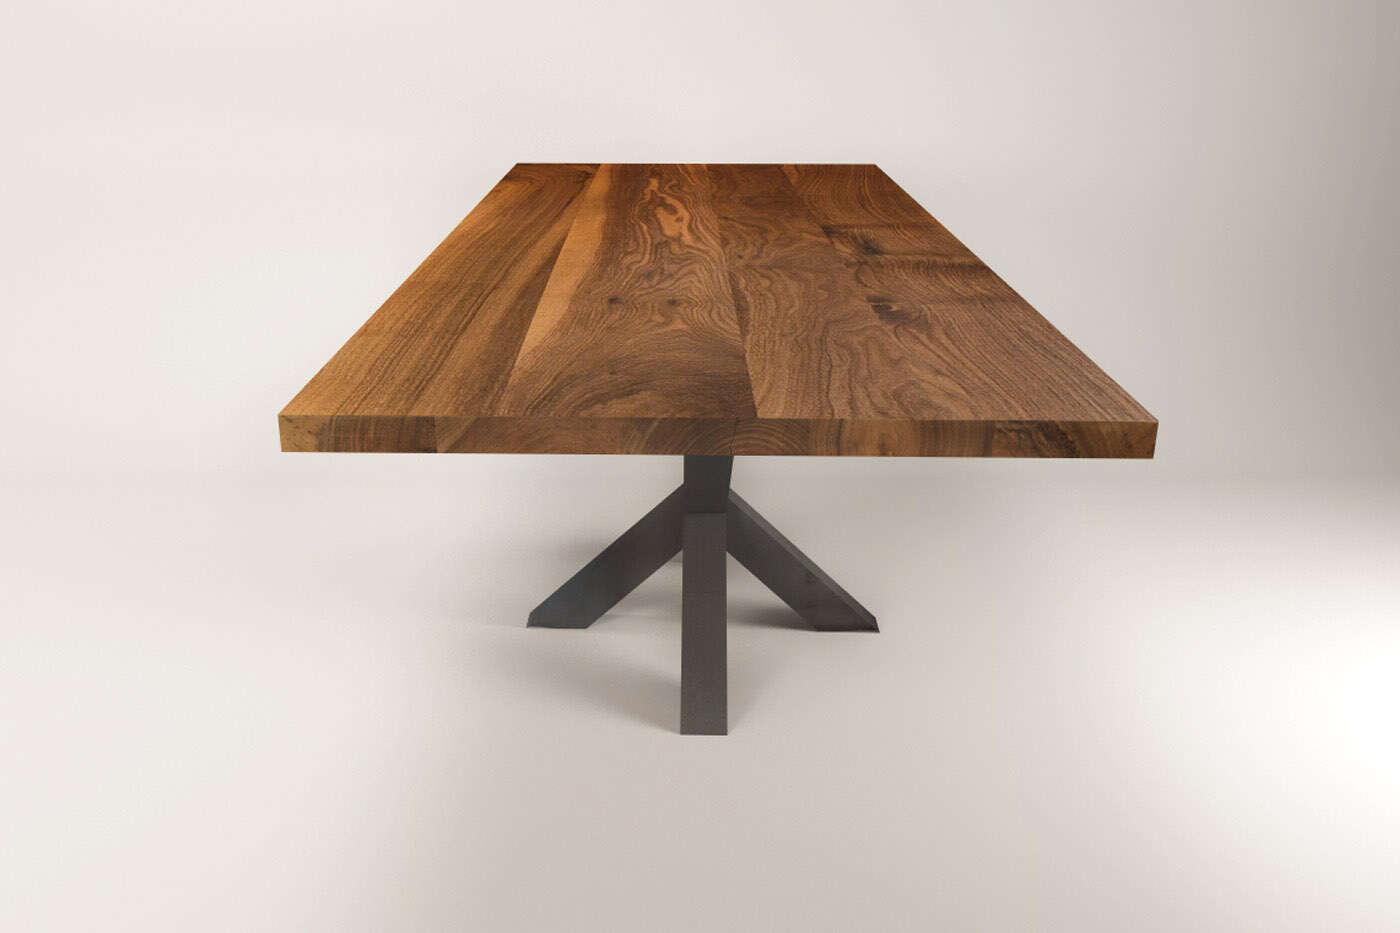 esstisch massiv nussbaum dalvik. Black Bedroom Furniture Sets. Home Design Ideas